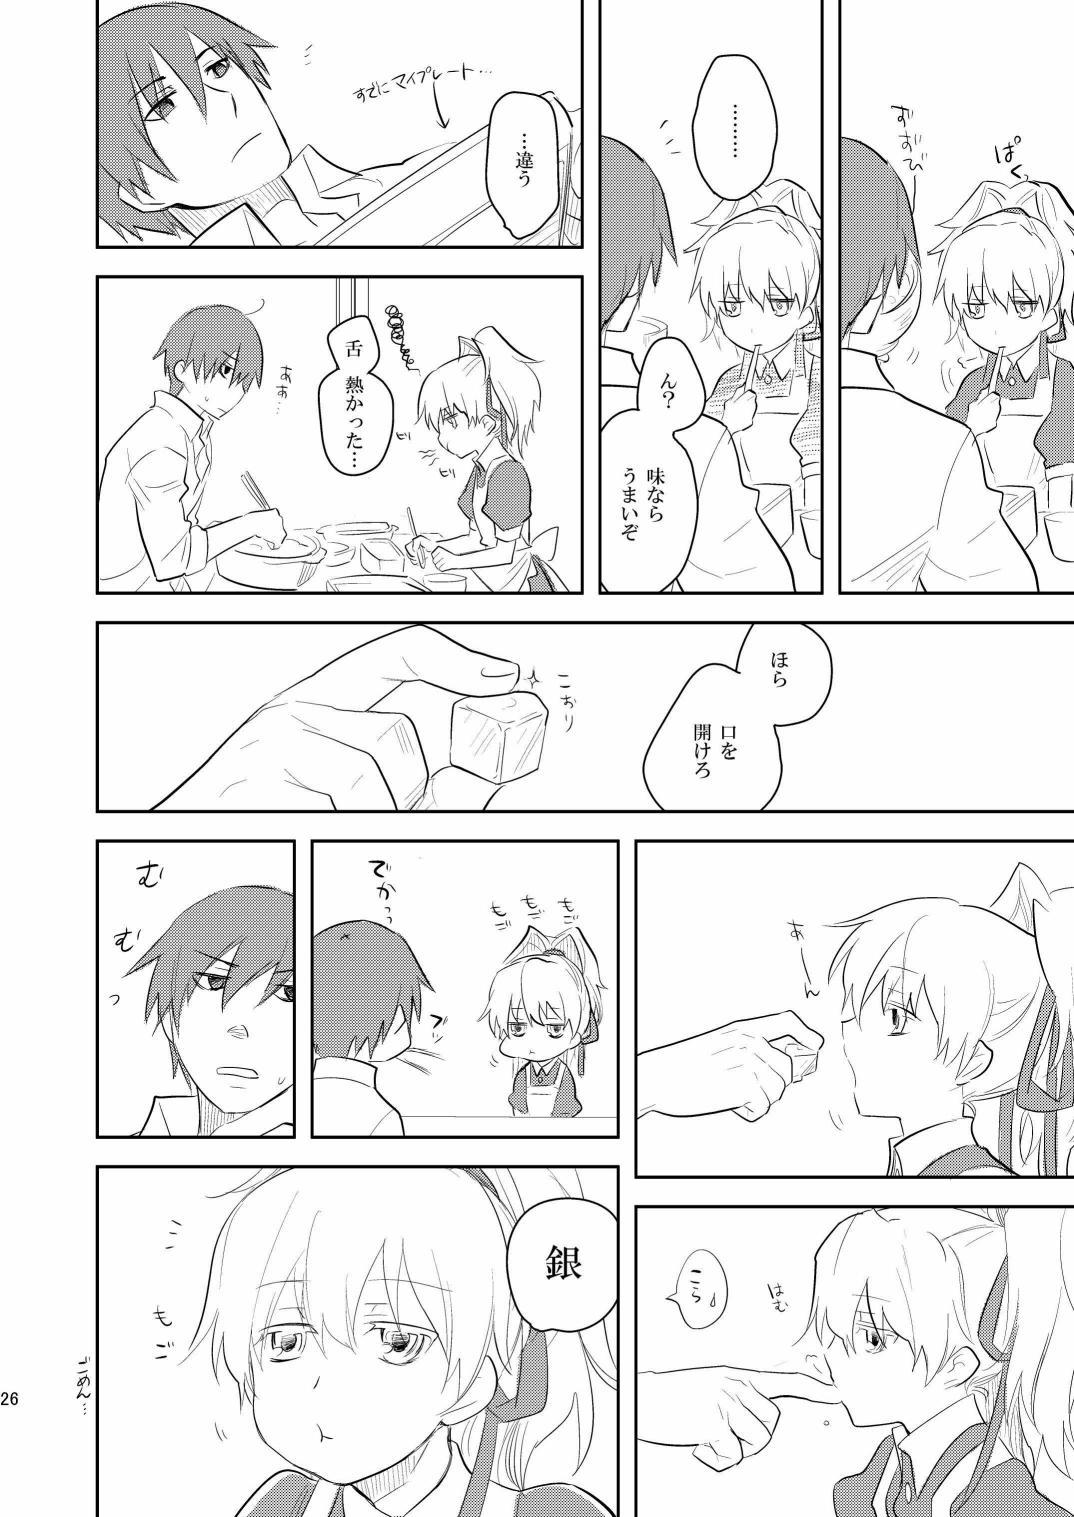 (COMIC1☆4) [AHM (Inu-Blade, Lact Mangan)] Kuroda (Tsuma) Shichihenge (DARKER THAN BLACK) 24